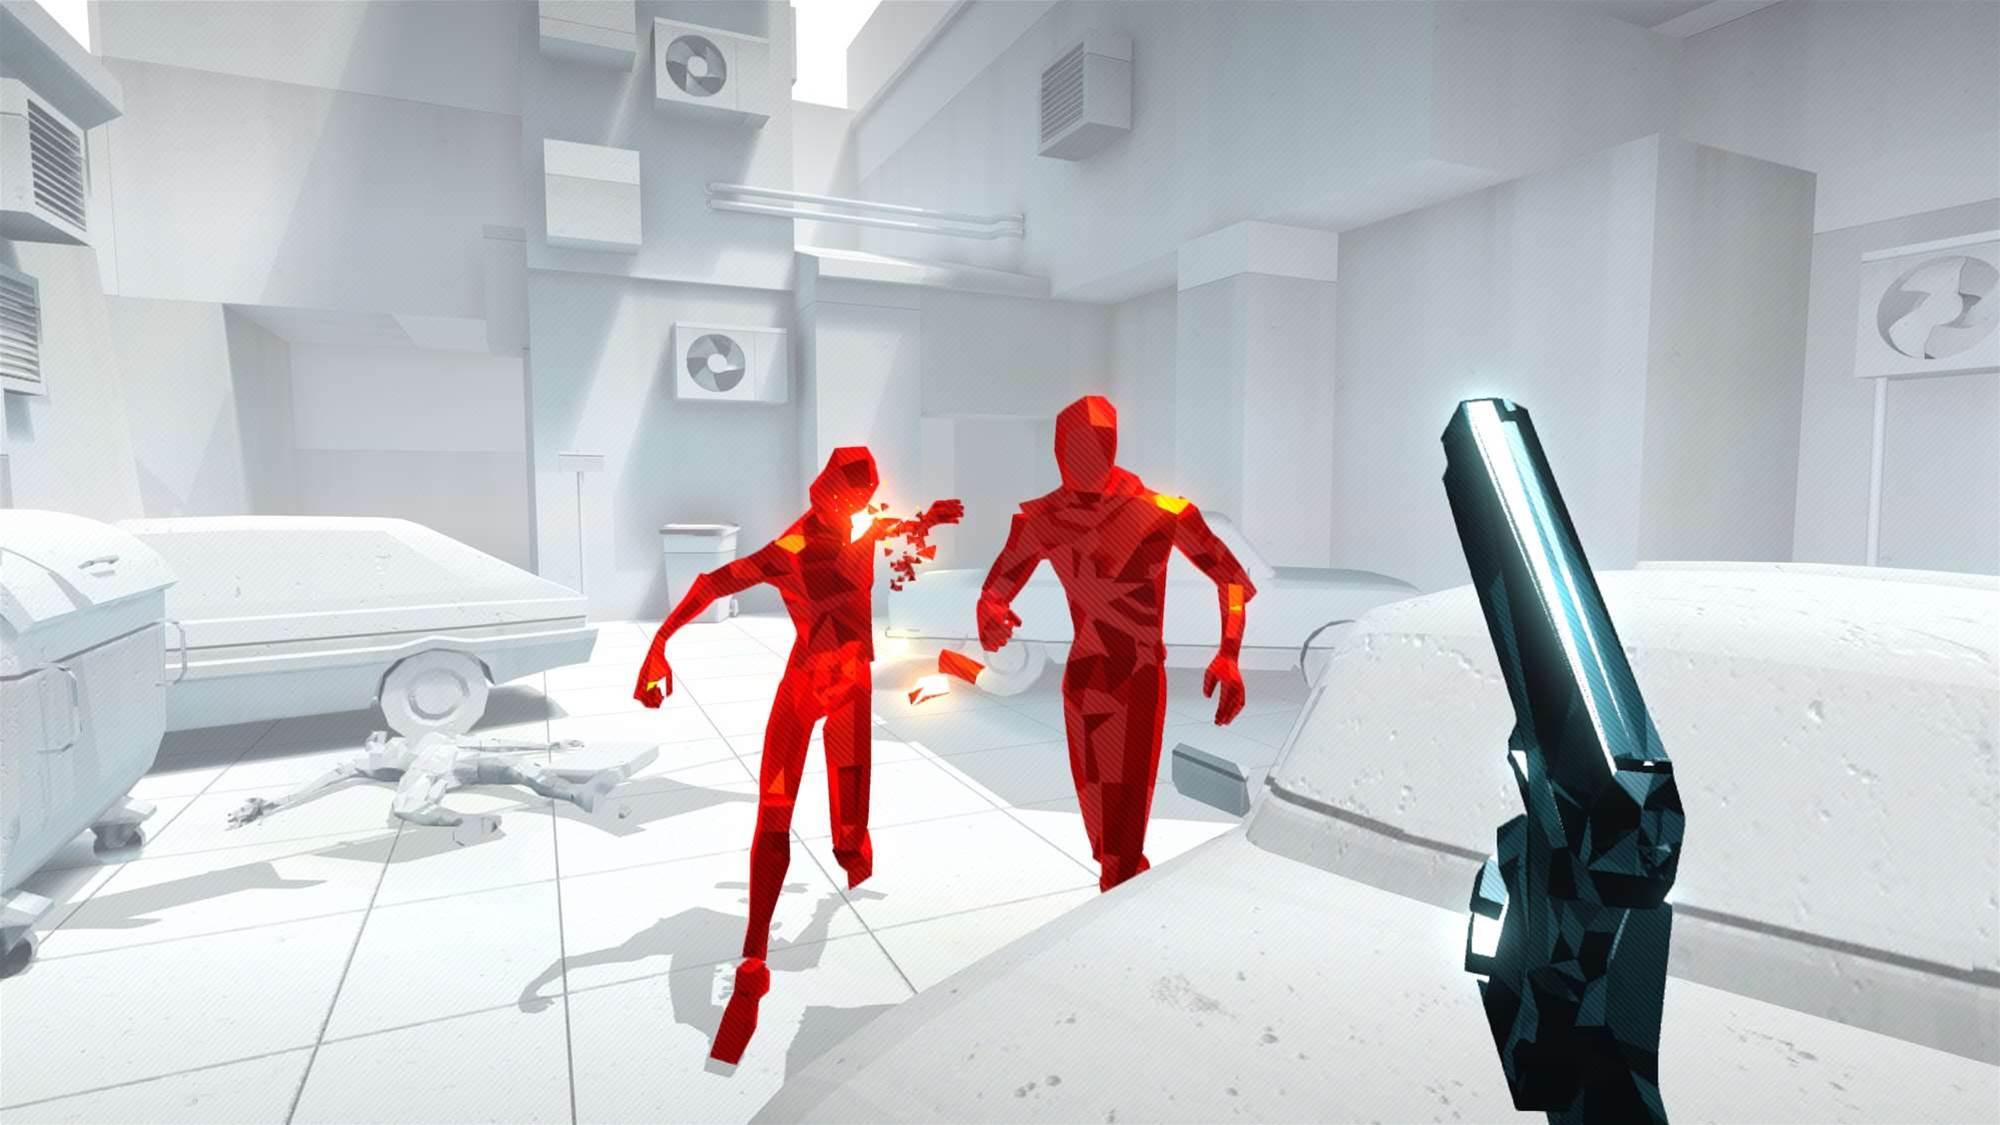 SUPERHOT gets release date, new trailer